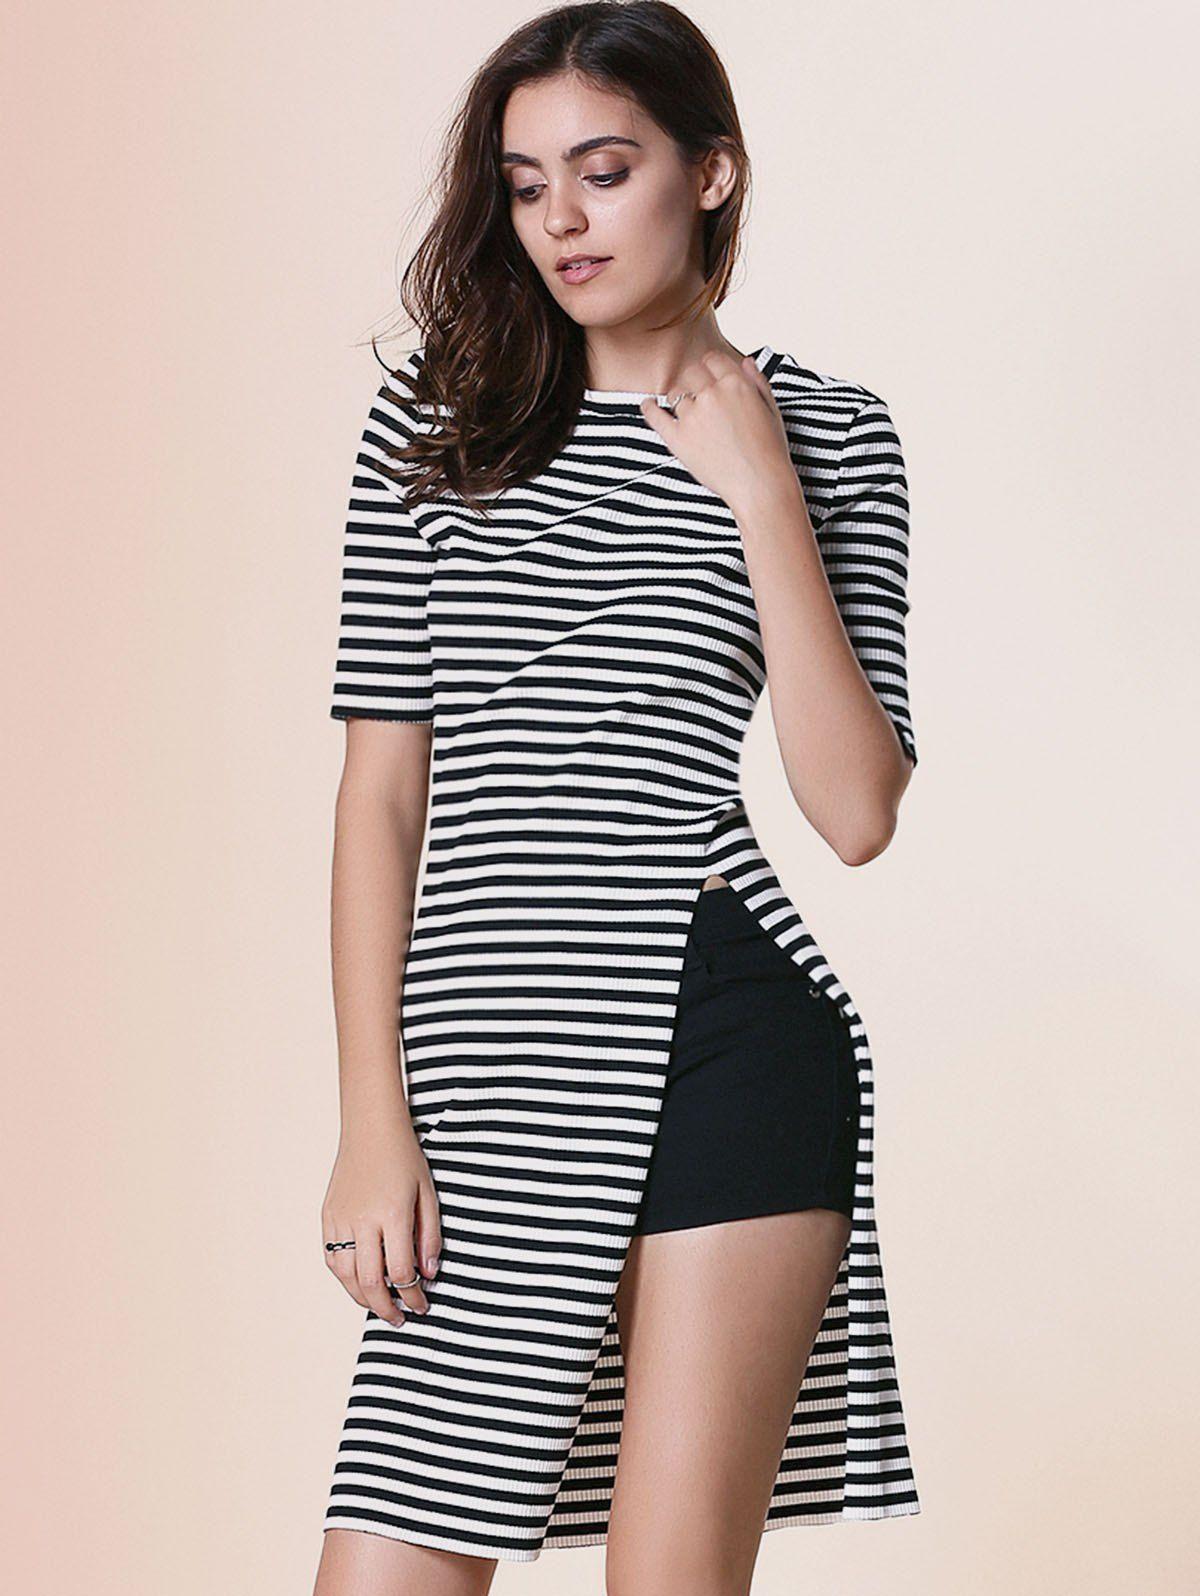 fdc88b1a65 Women s Stylish Round Neck Short Sleeve Striped Furcal Dress ...